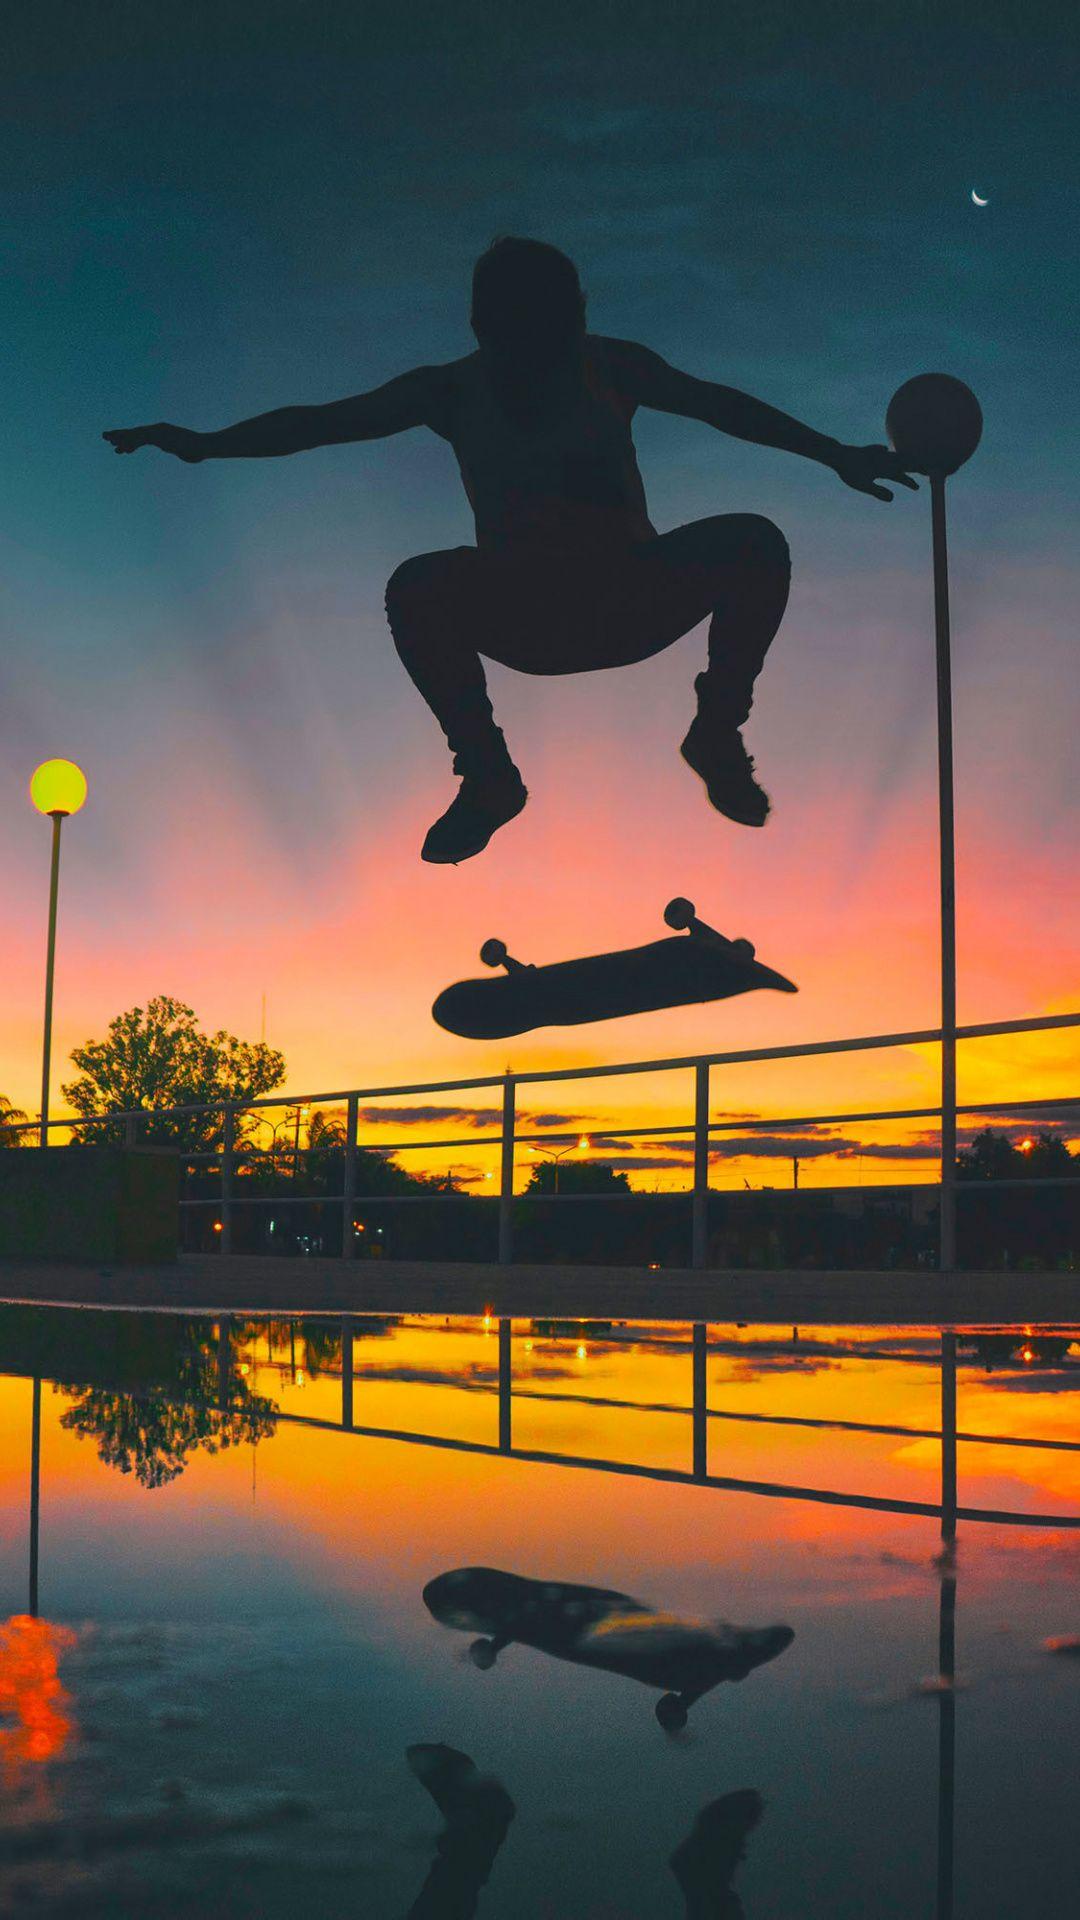 Man skateboarding sports sunset silhouette 1080x1920 1080x1920